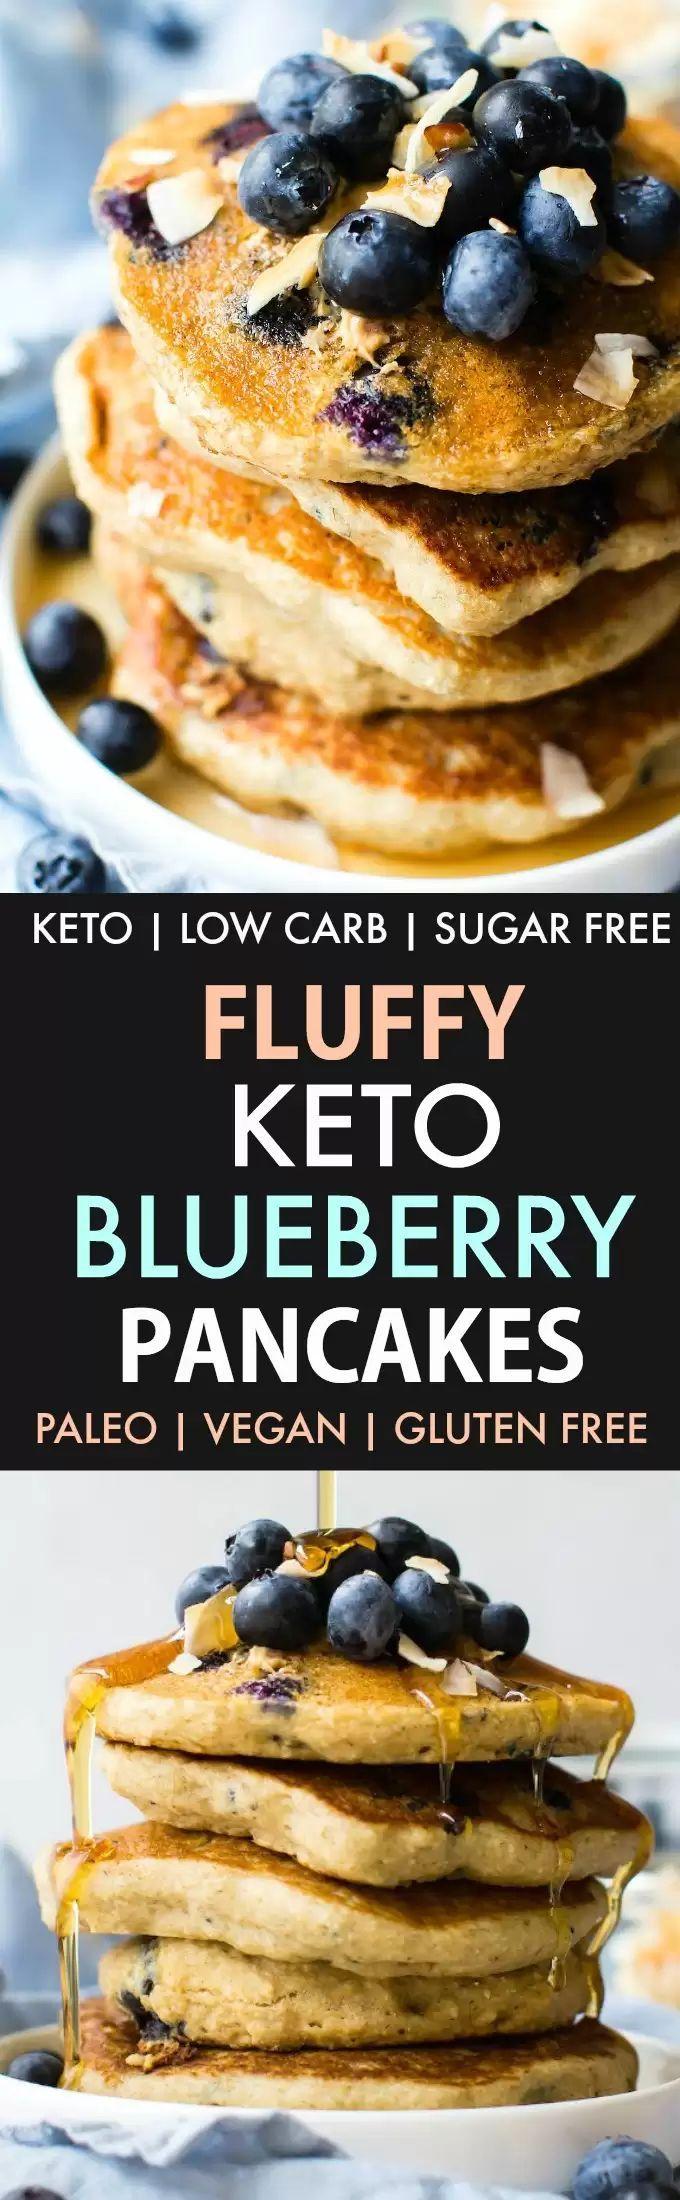 Fluffy Low Carb Keto Blueberry Pancakes (Paleo, Vegan, Flourless)- Thick and flu...  - Keto -